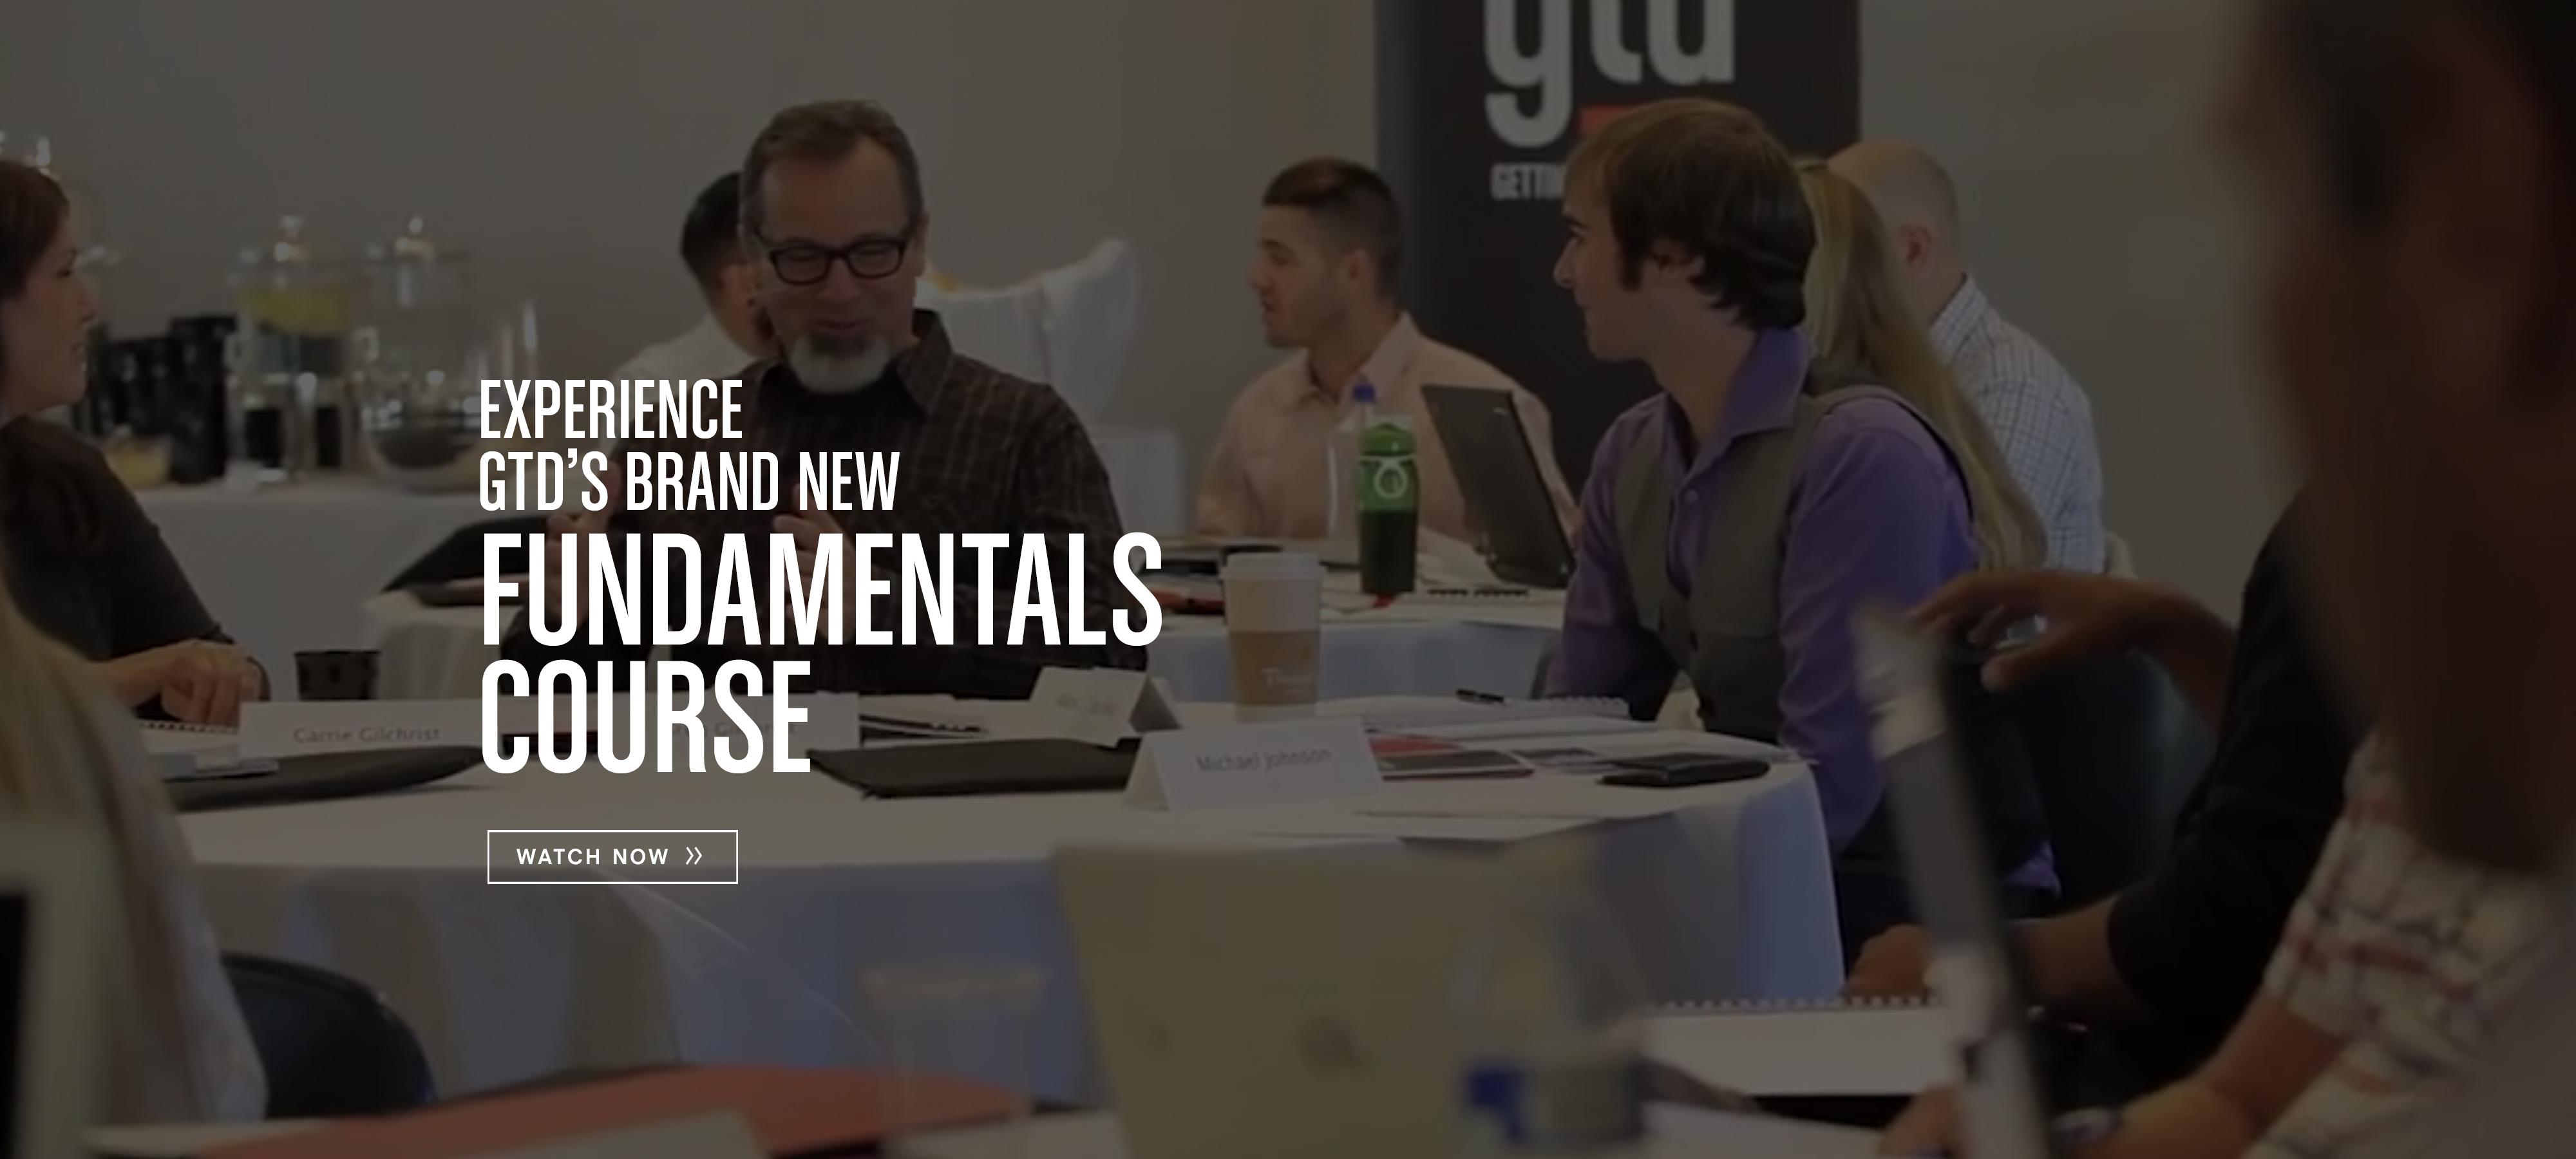 GTD Fundamentals Anthem Video Released